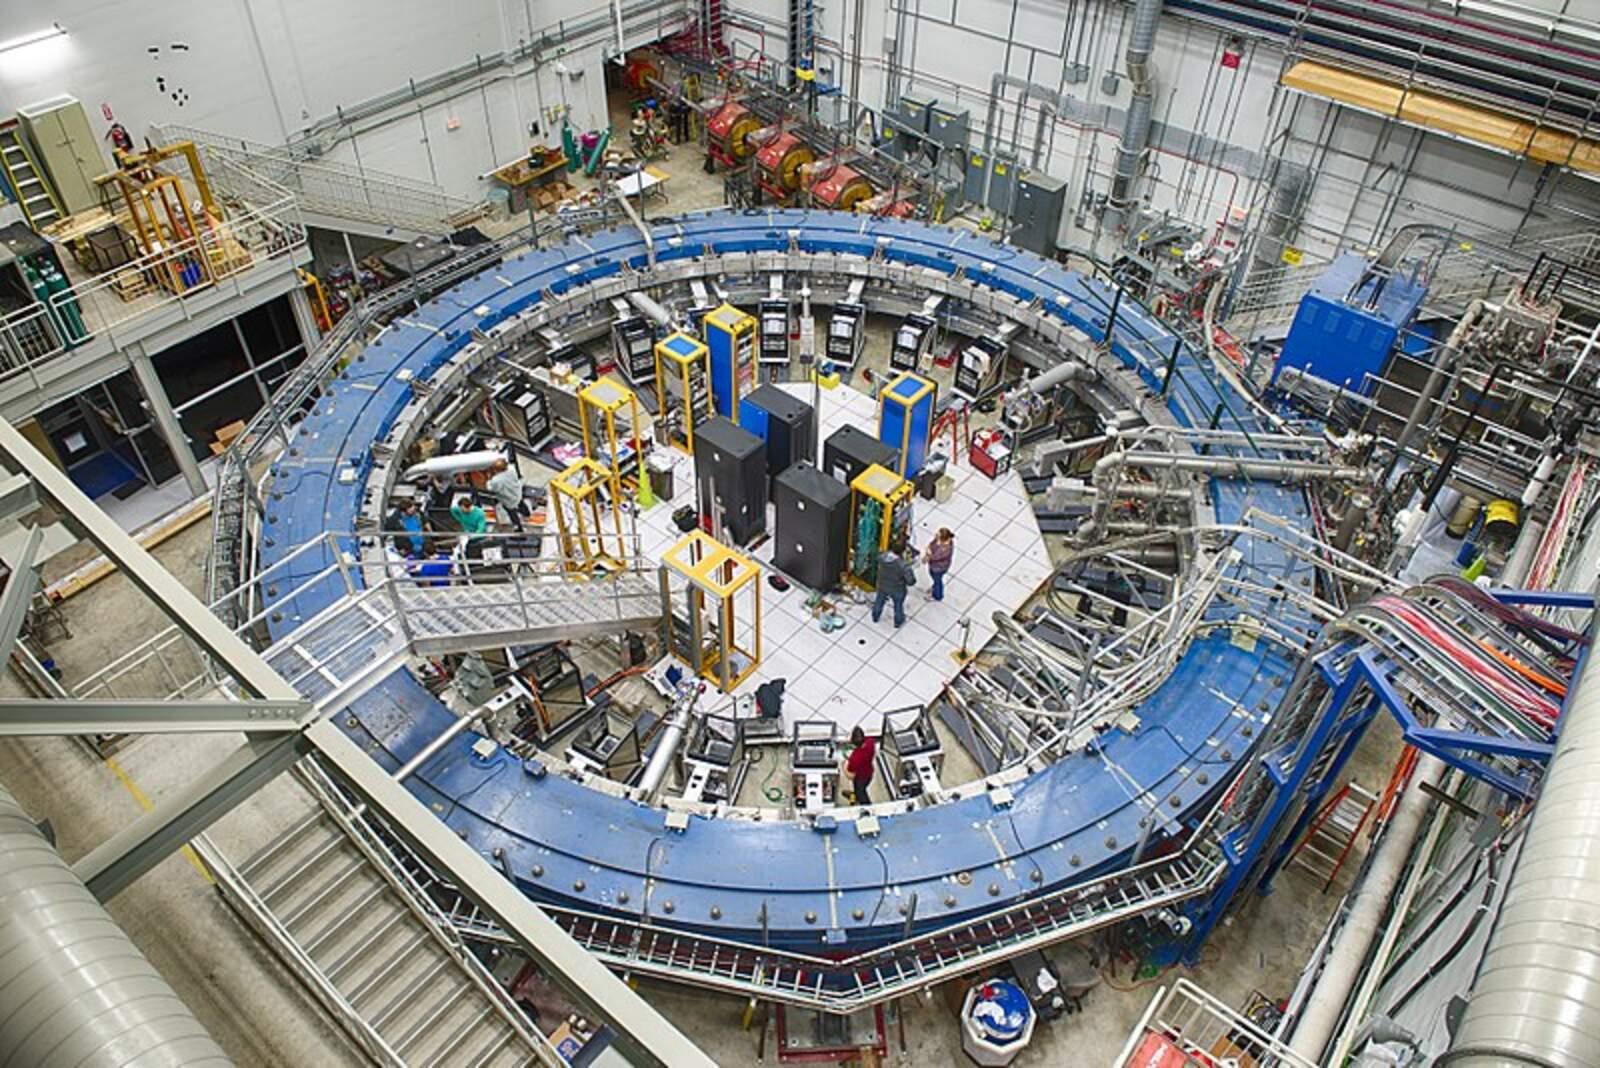 L'anella emprada per a l'experiment Muon g-2 al Fermilab (Batavia, Illinois)